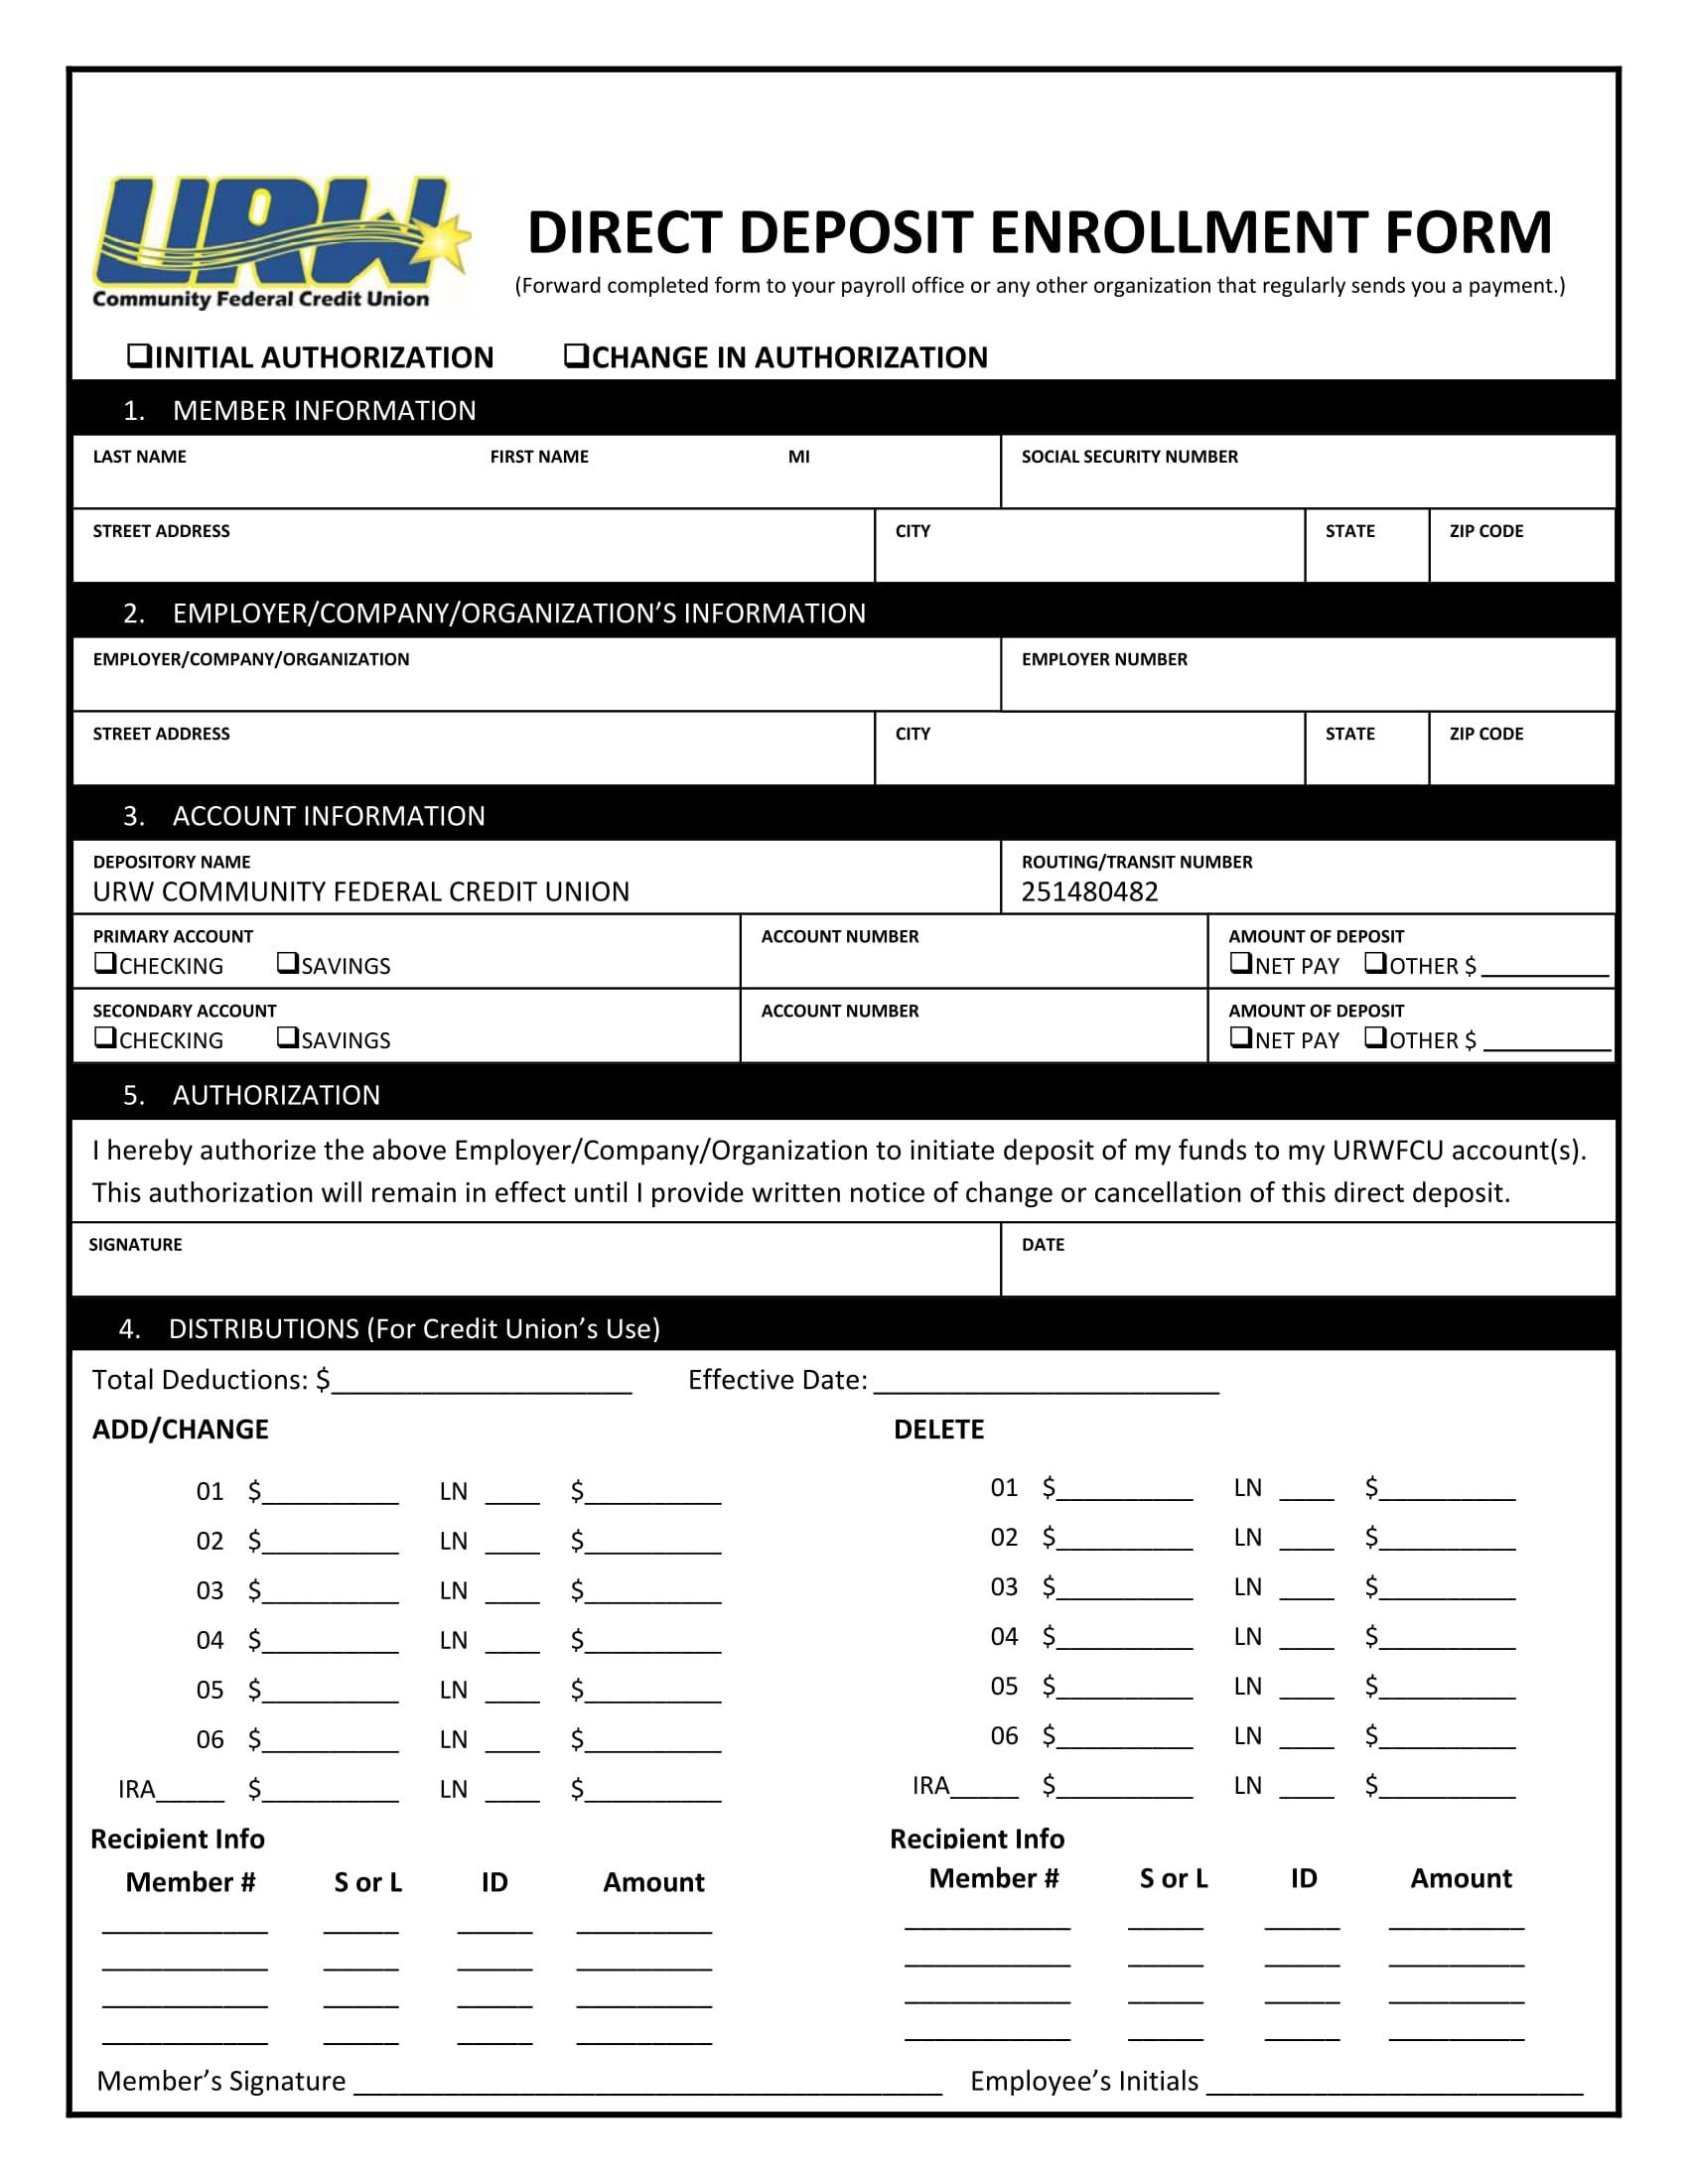 payroll direct deposit enrollment form 1